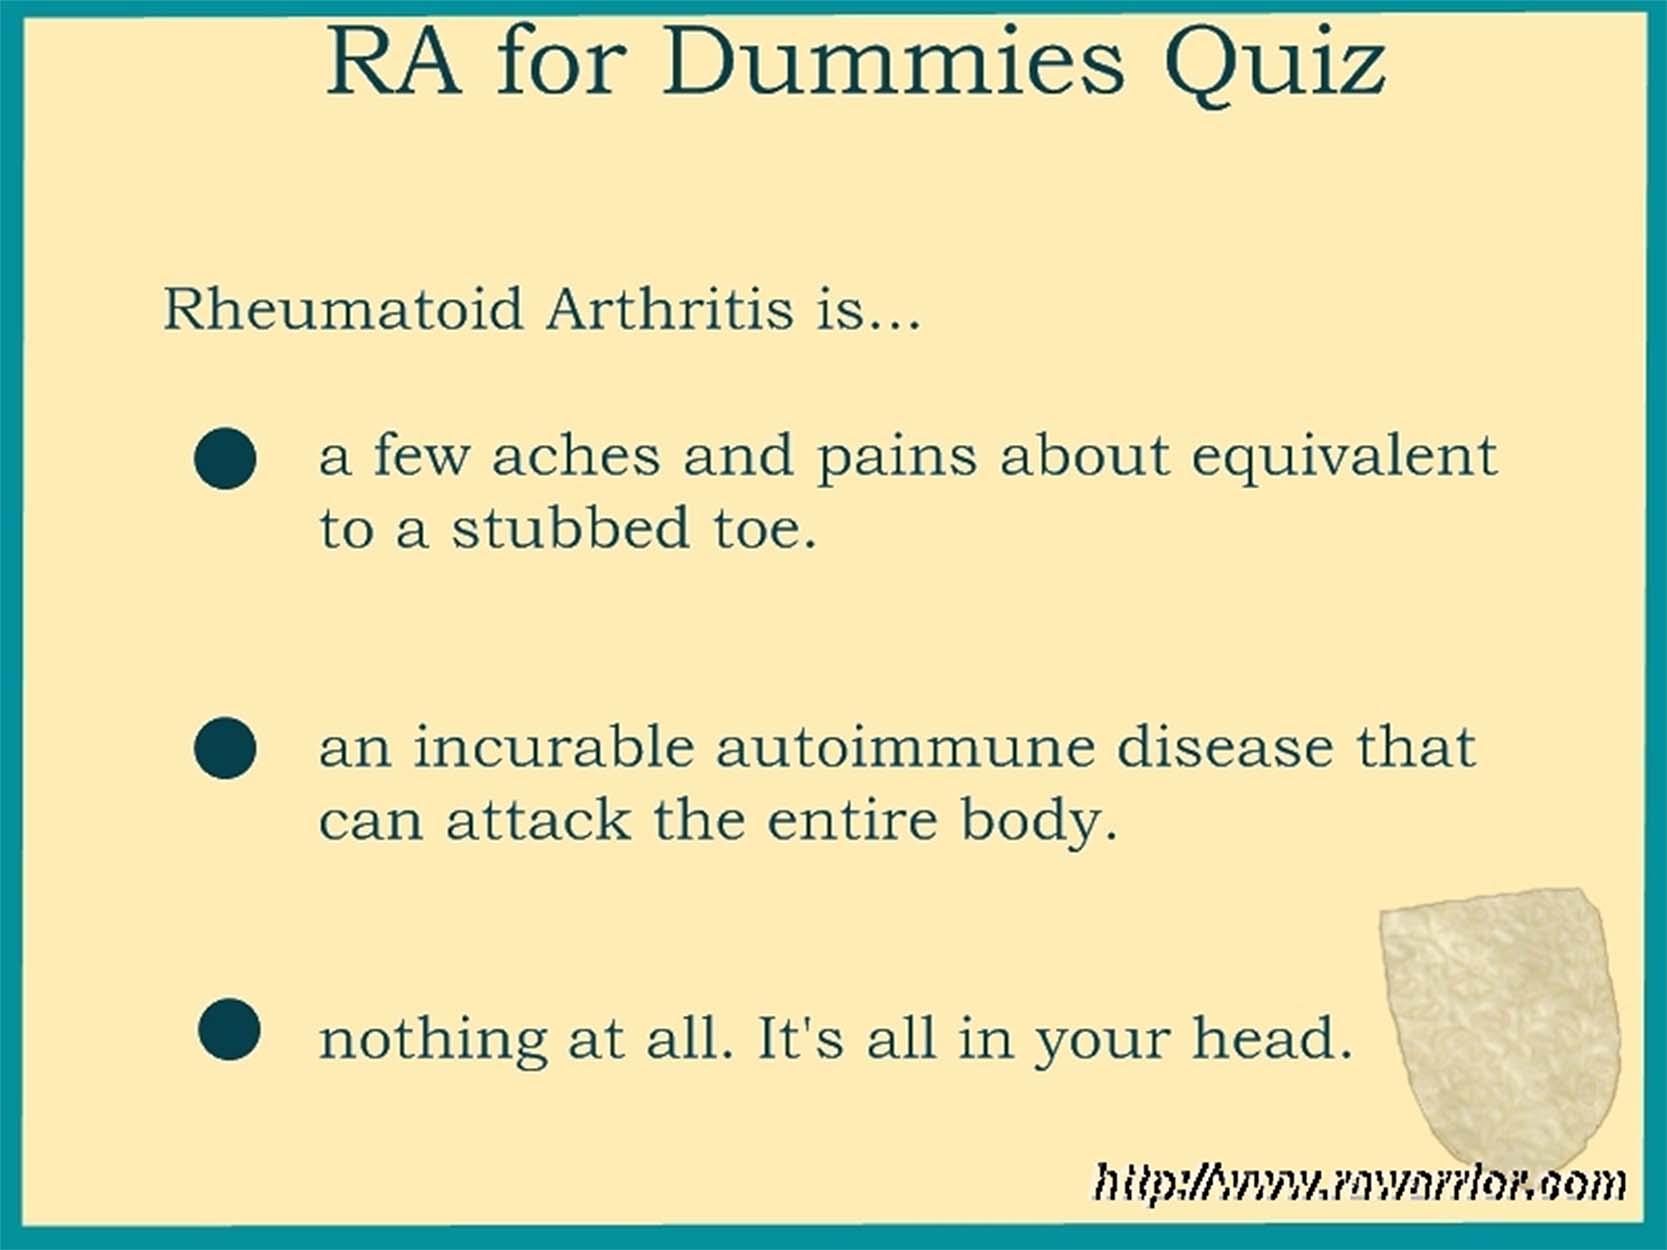 RA quiz for dummies